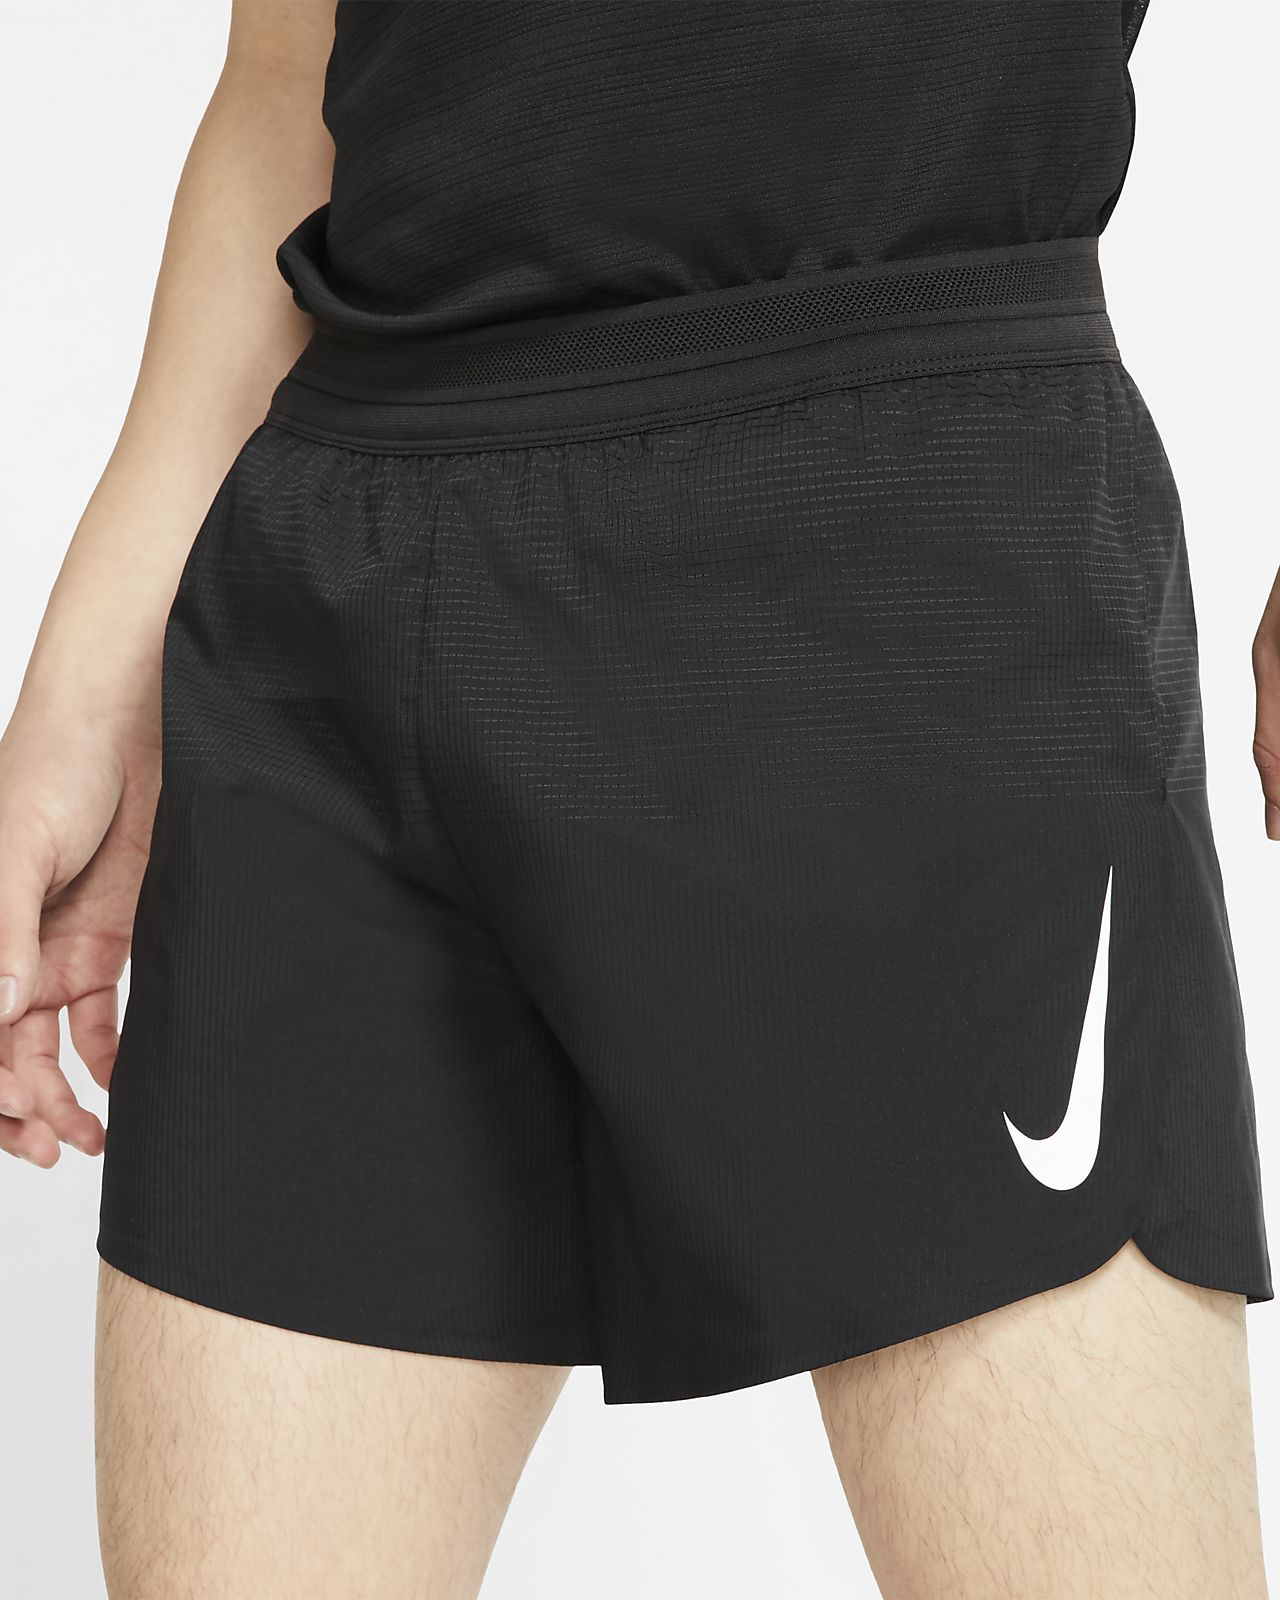 Nike AeroSwift (London) løpeshorts til herre (12,5 cm)